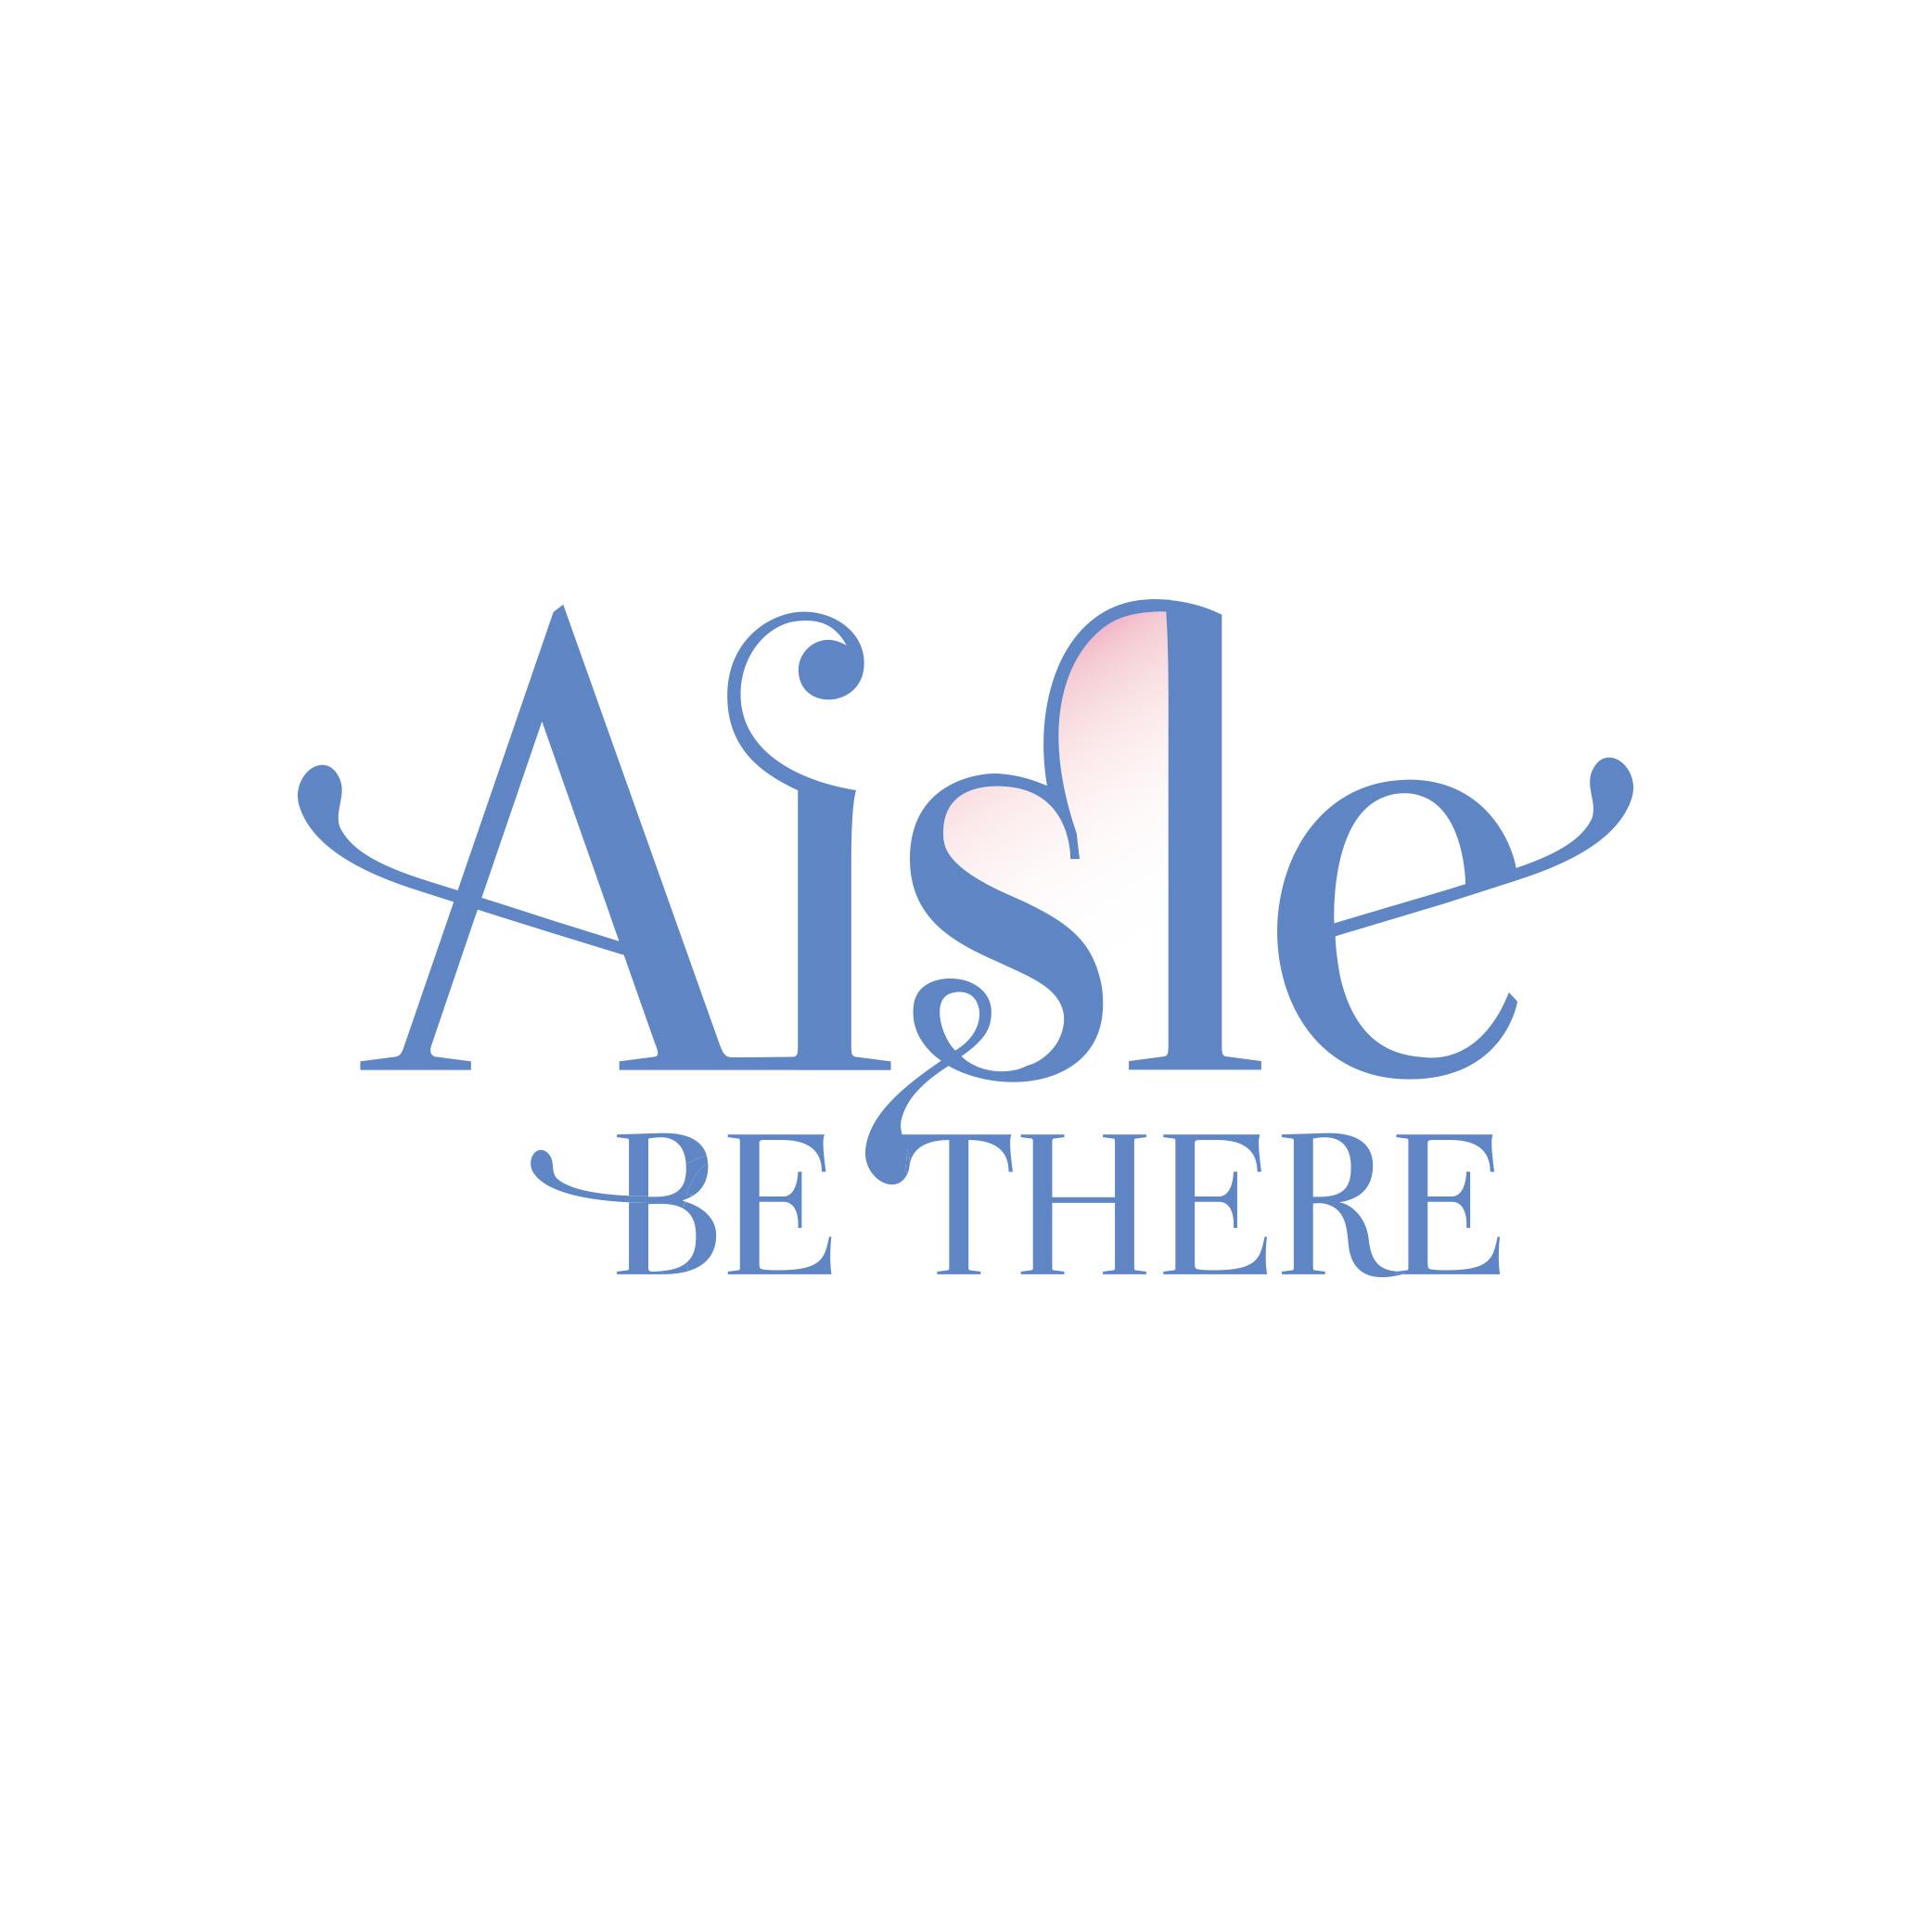 AisleBeThere.jpg